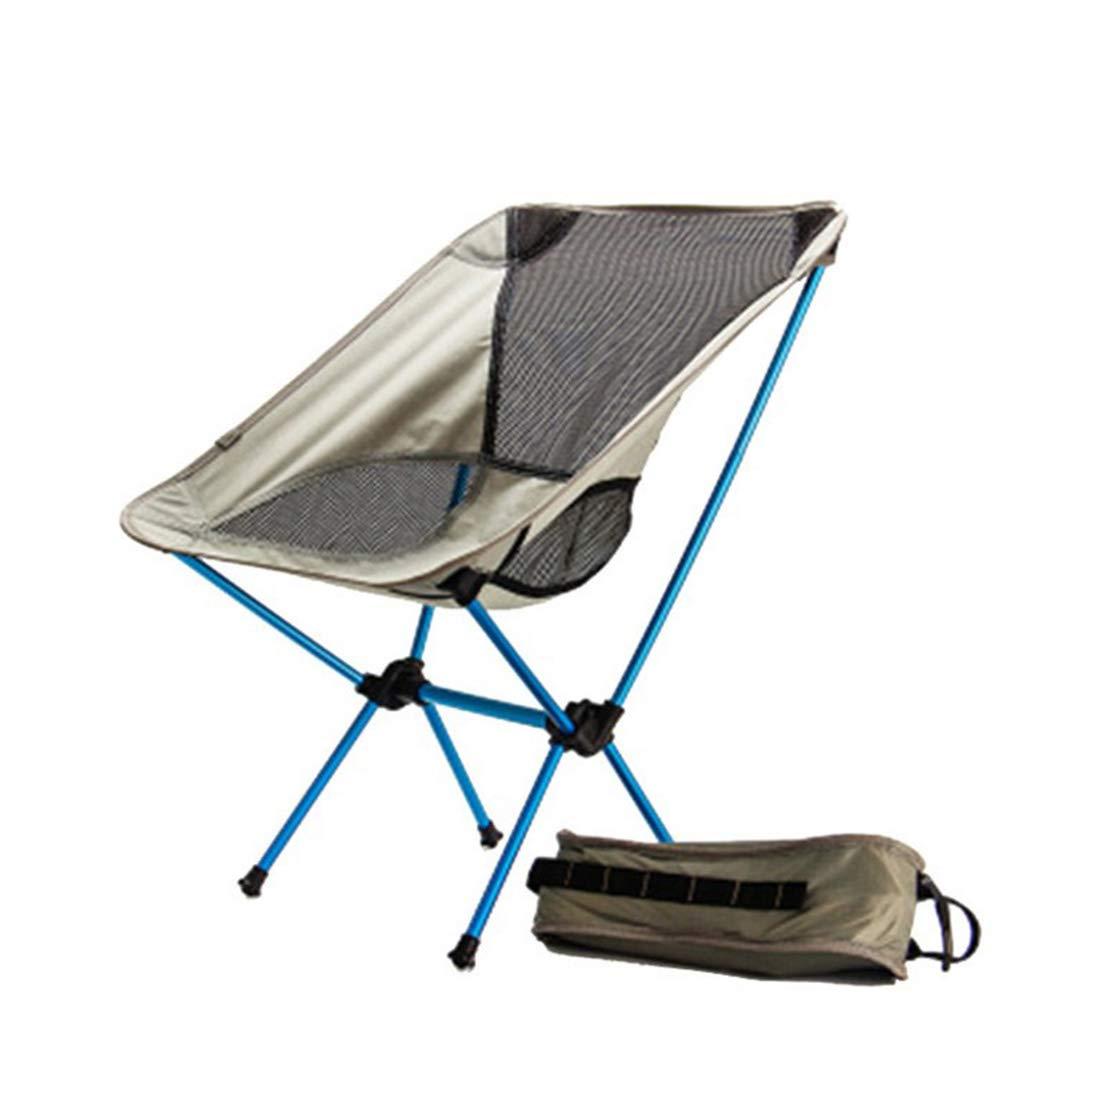 FUBULECY Outdoor Camping Luftfahrt Aluminiumlegierung Klapp Angeln Stuhl.